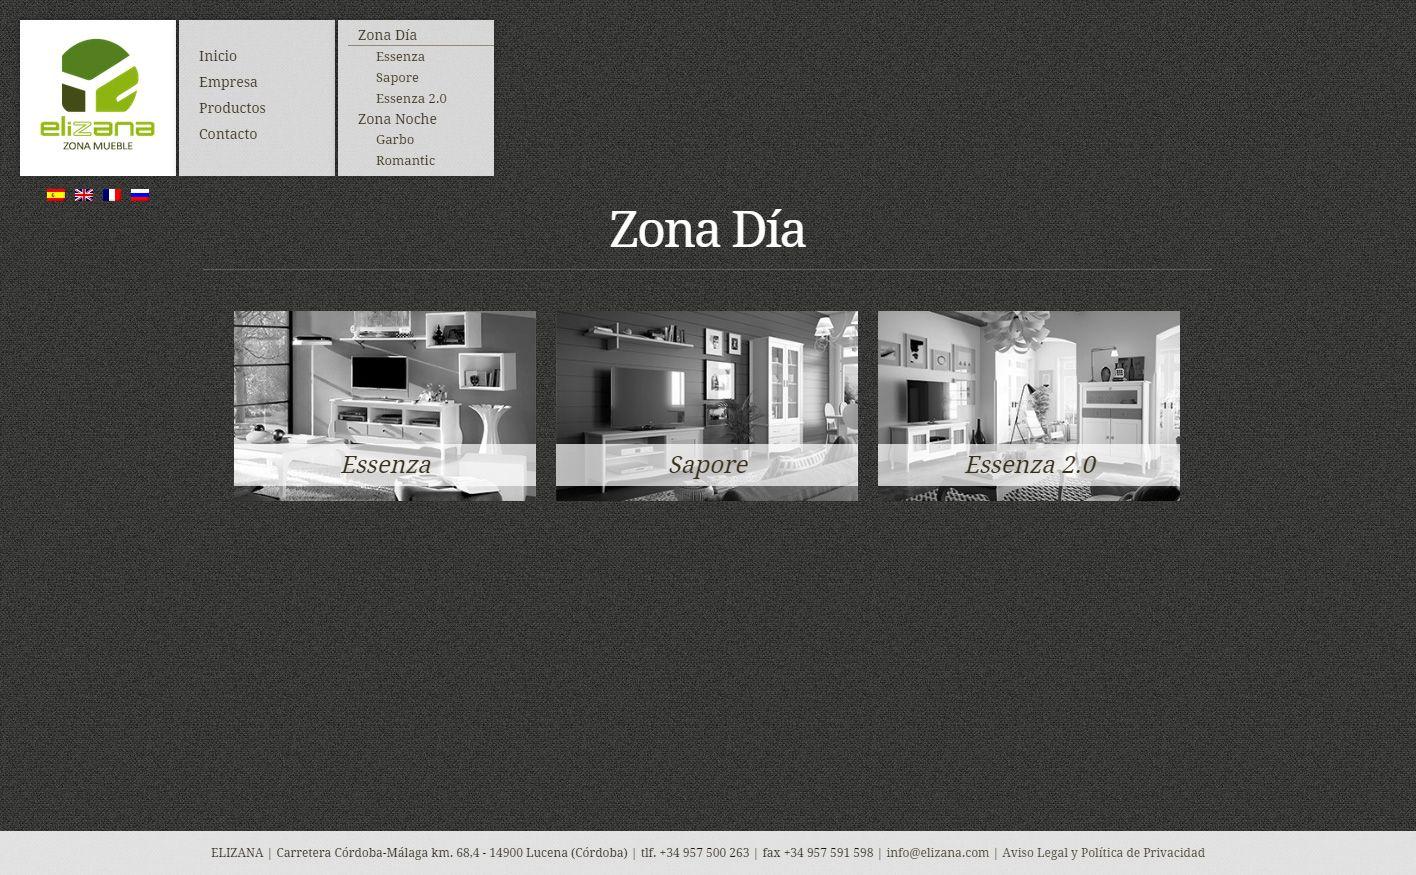 elizana-content-03